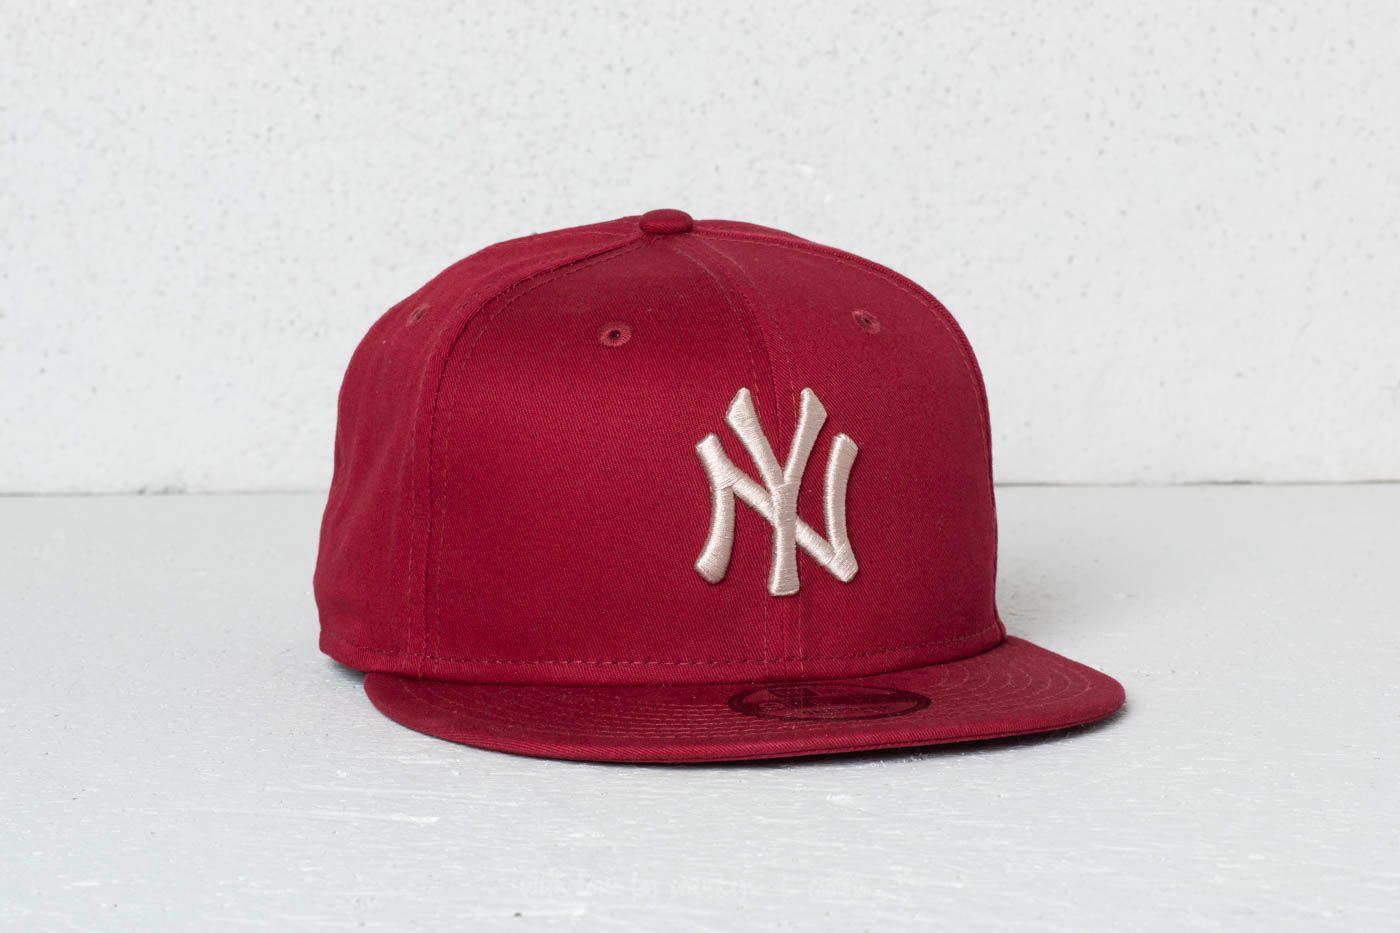 83a1a216ba3 New Era 9Fifty MLB League Essential New York Yankees Cap Cardinal  Satin